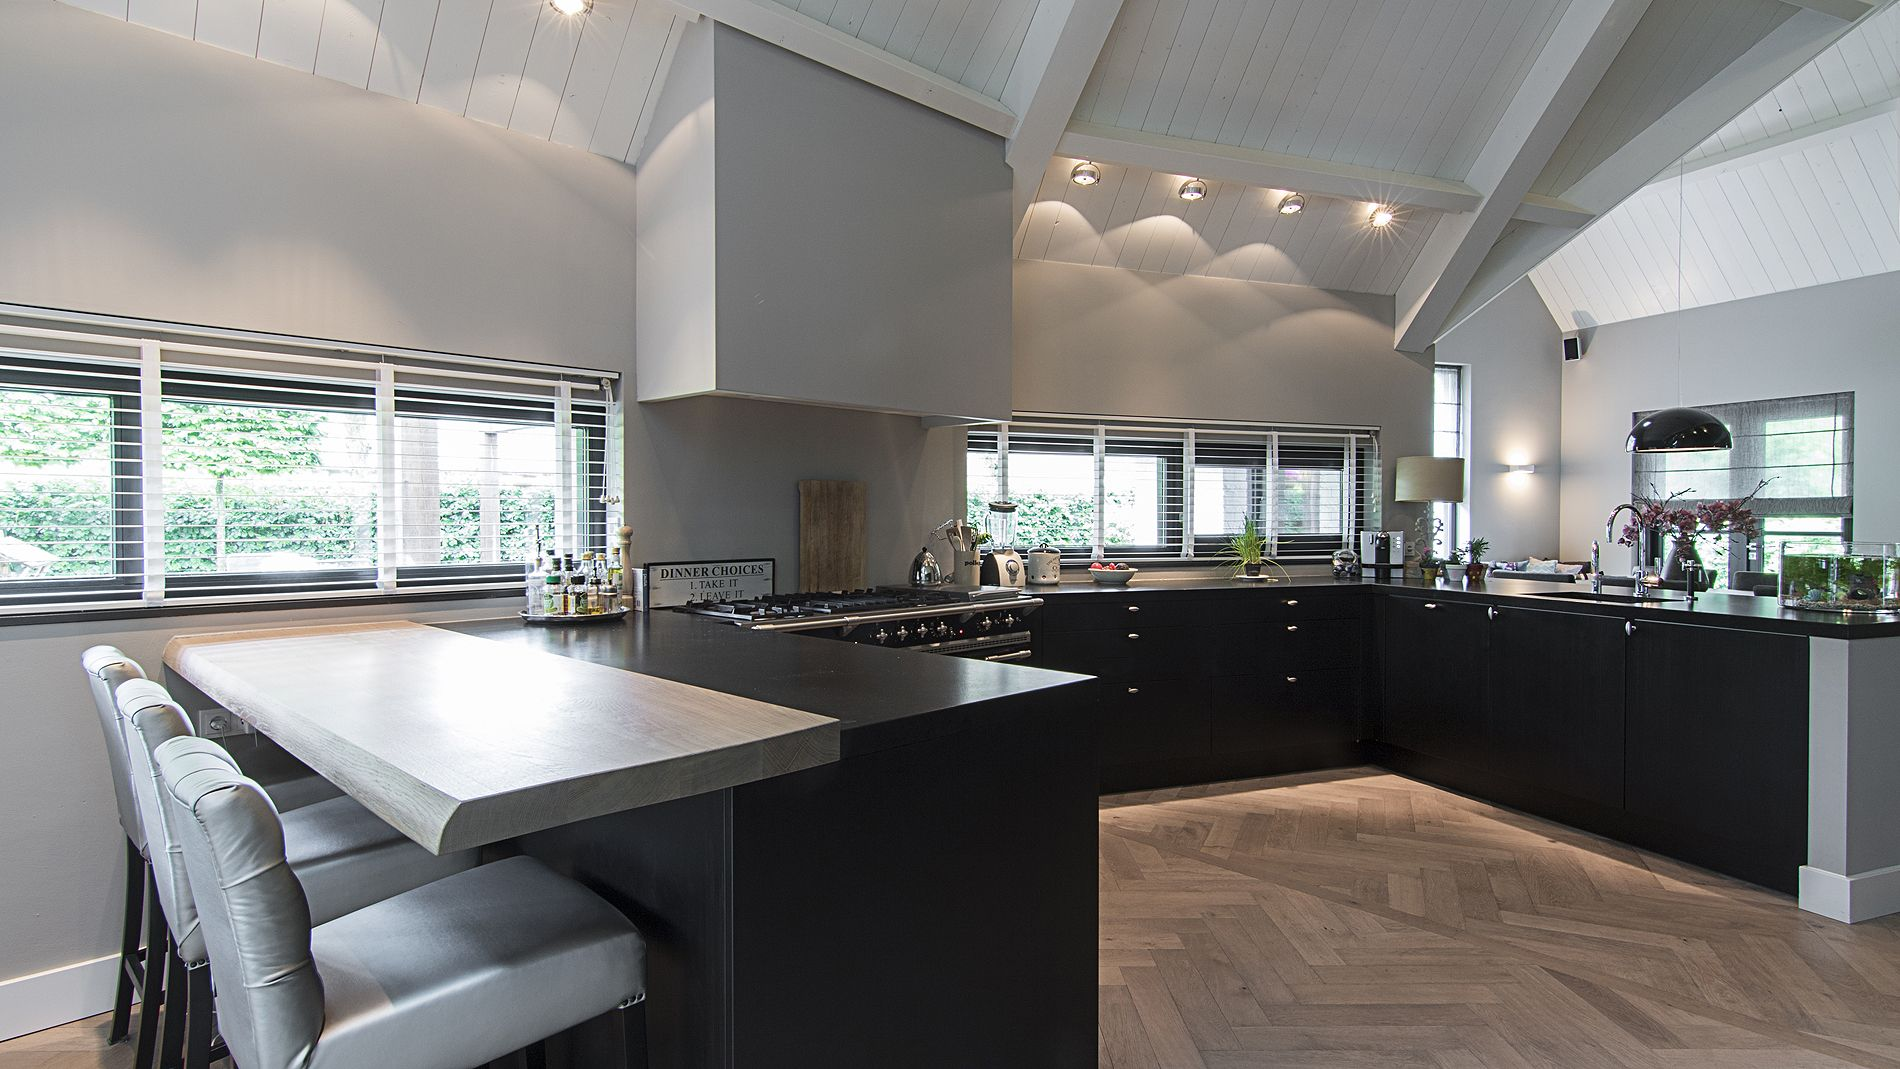 Eggersmann maatwerk keuken zwart eiken keuken